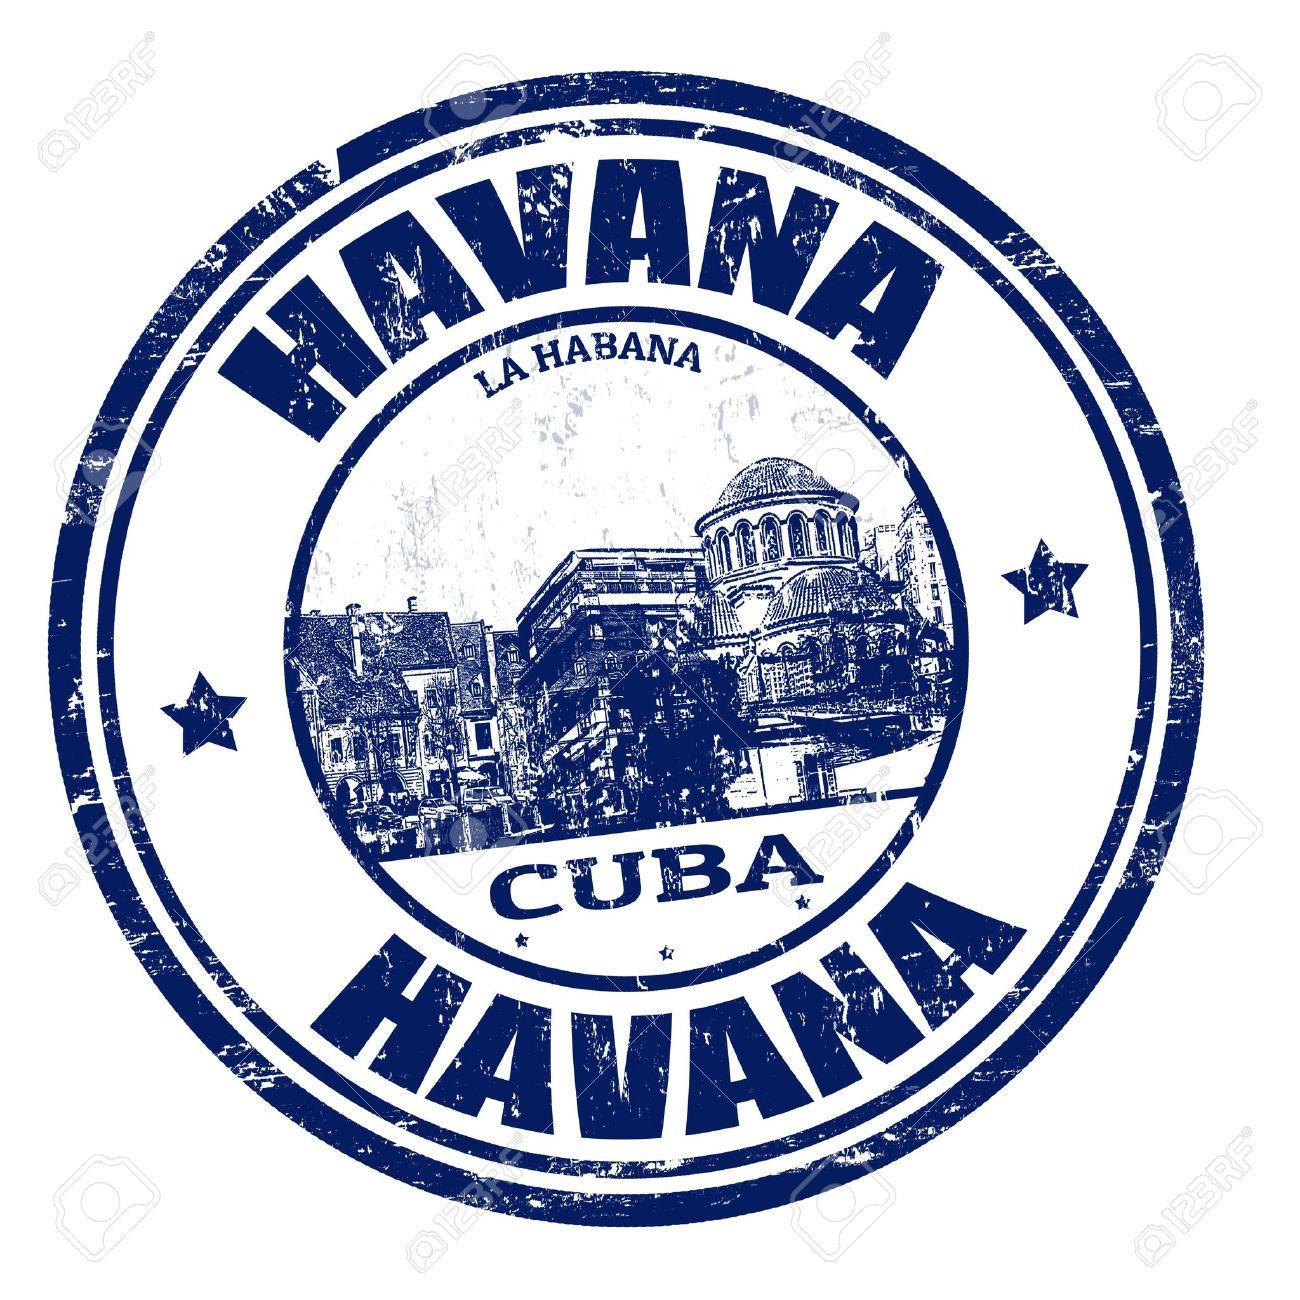 Cuba clipart #6, Download drawings